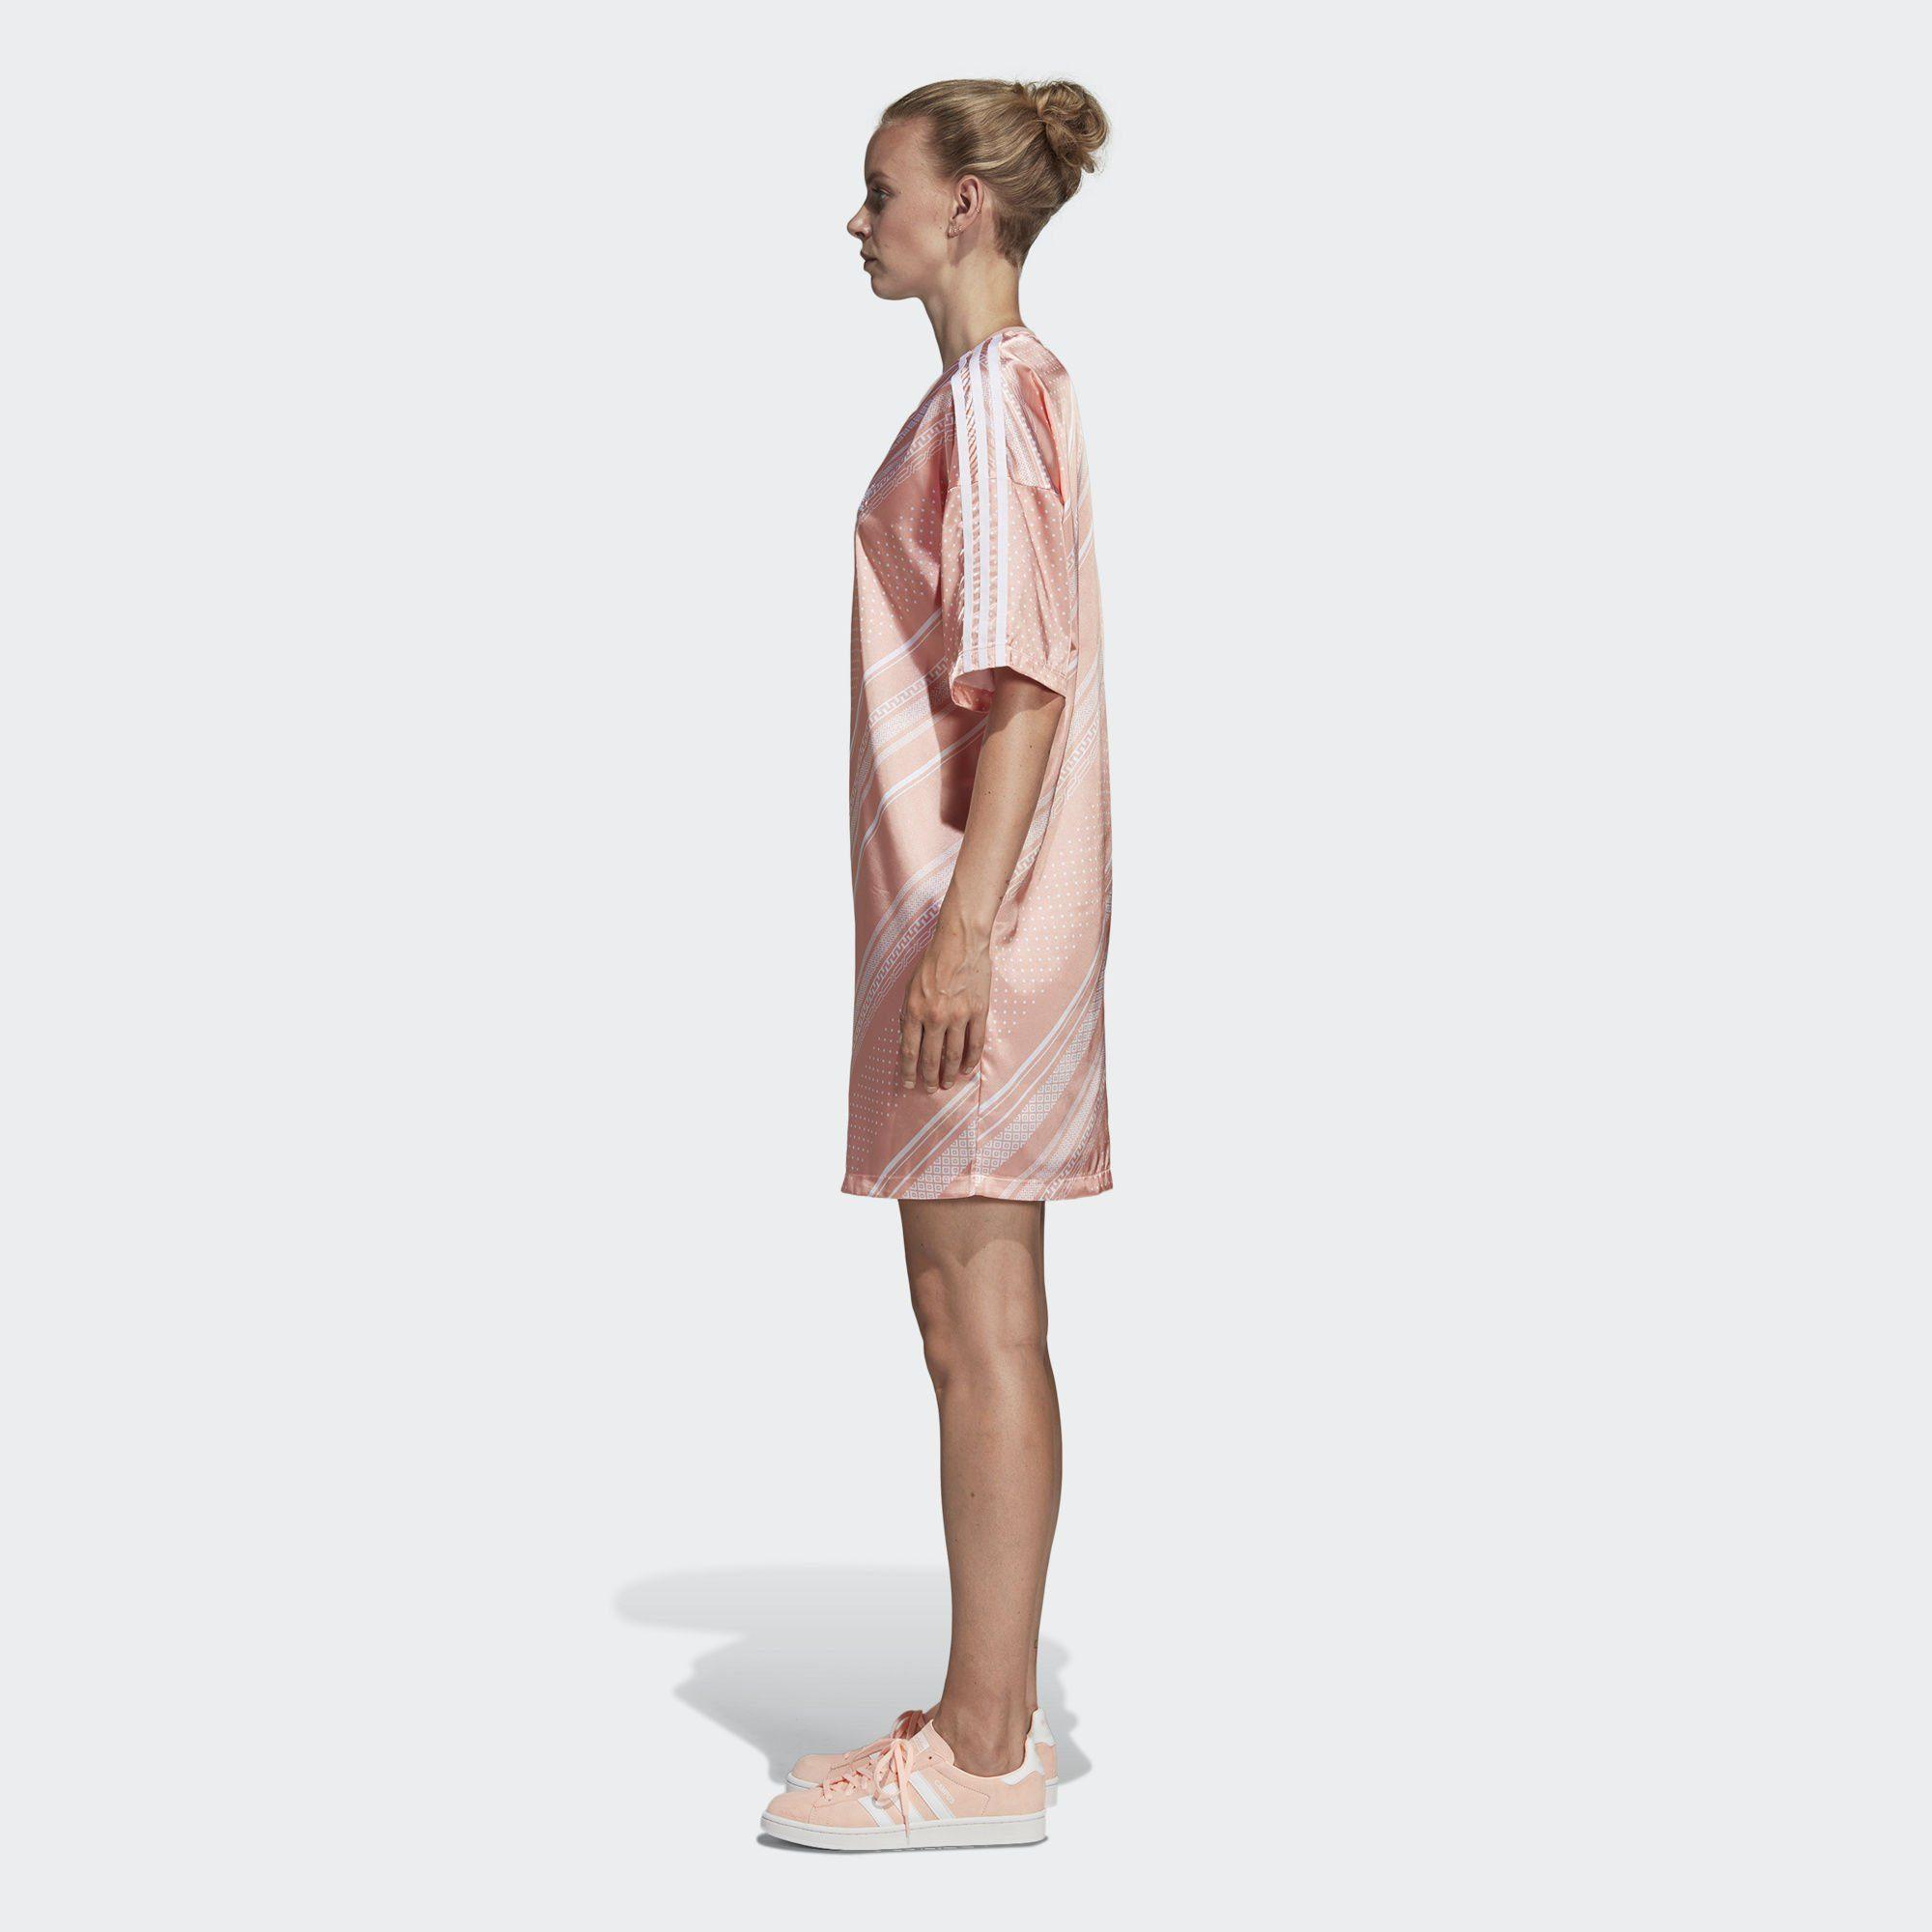 adidas Originals Shirtkleid »Trefoil Kleid« adicolor;Trefoil online kaufen | OTTO